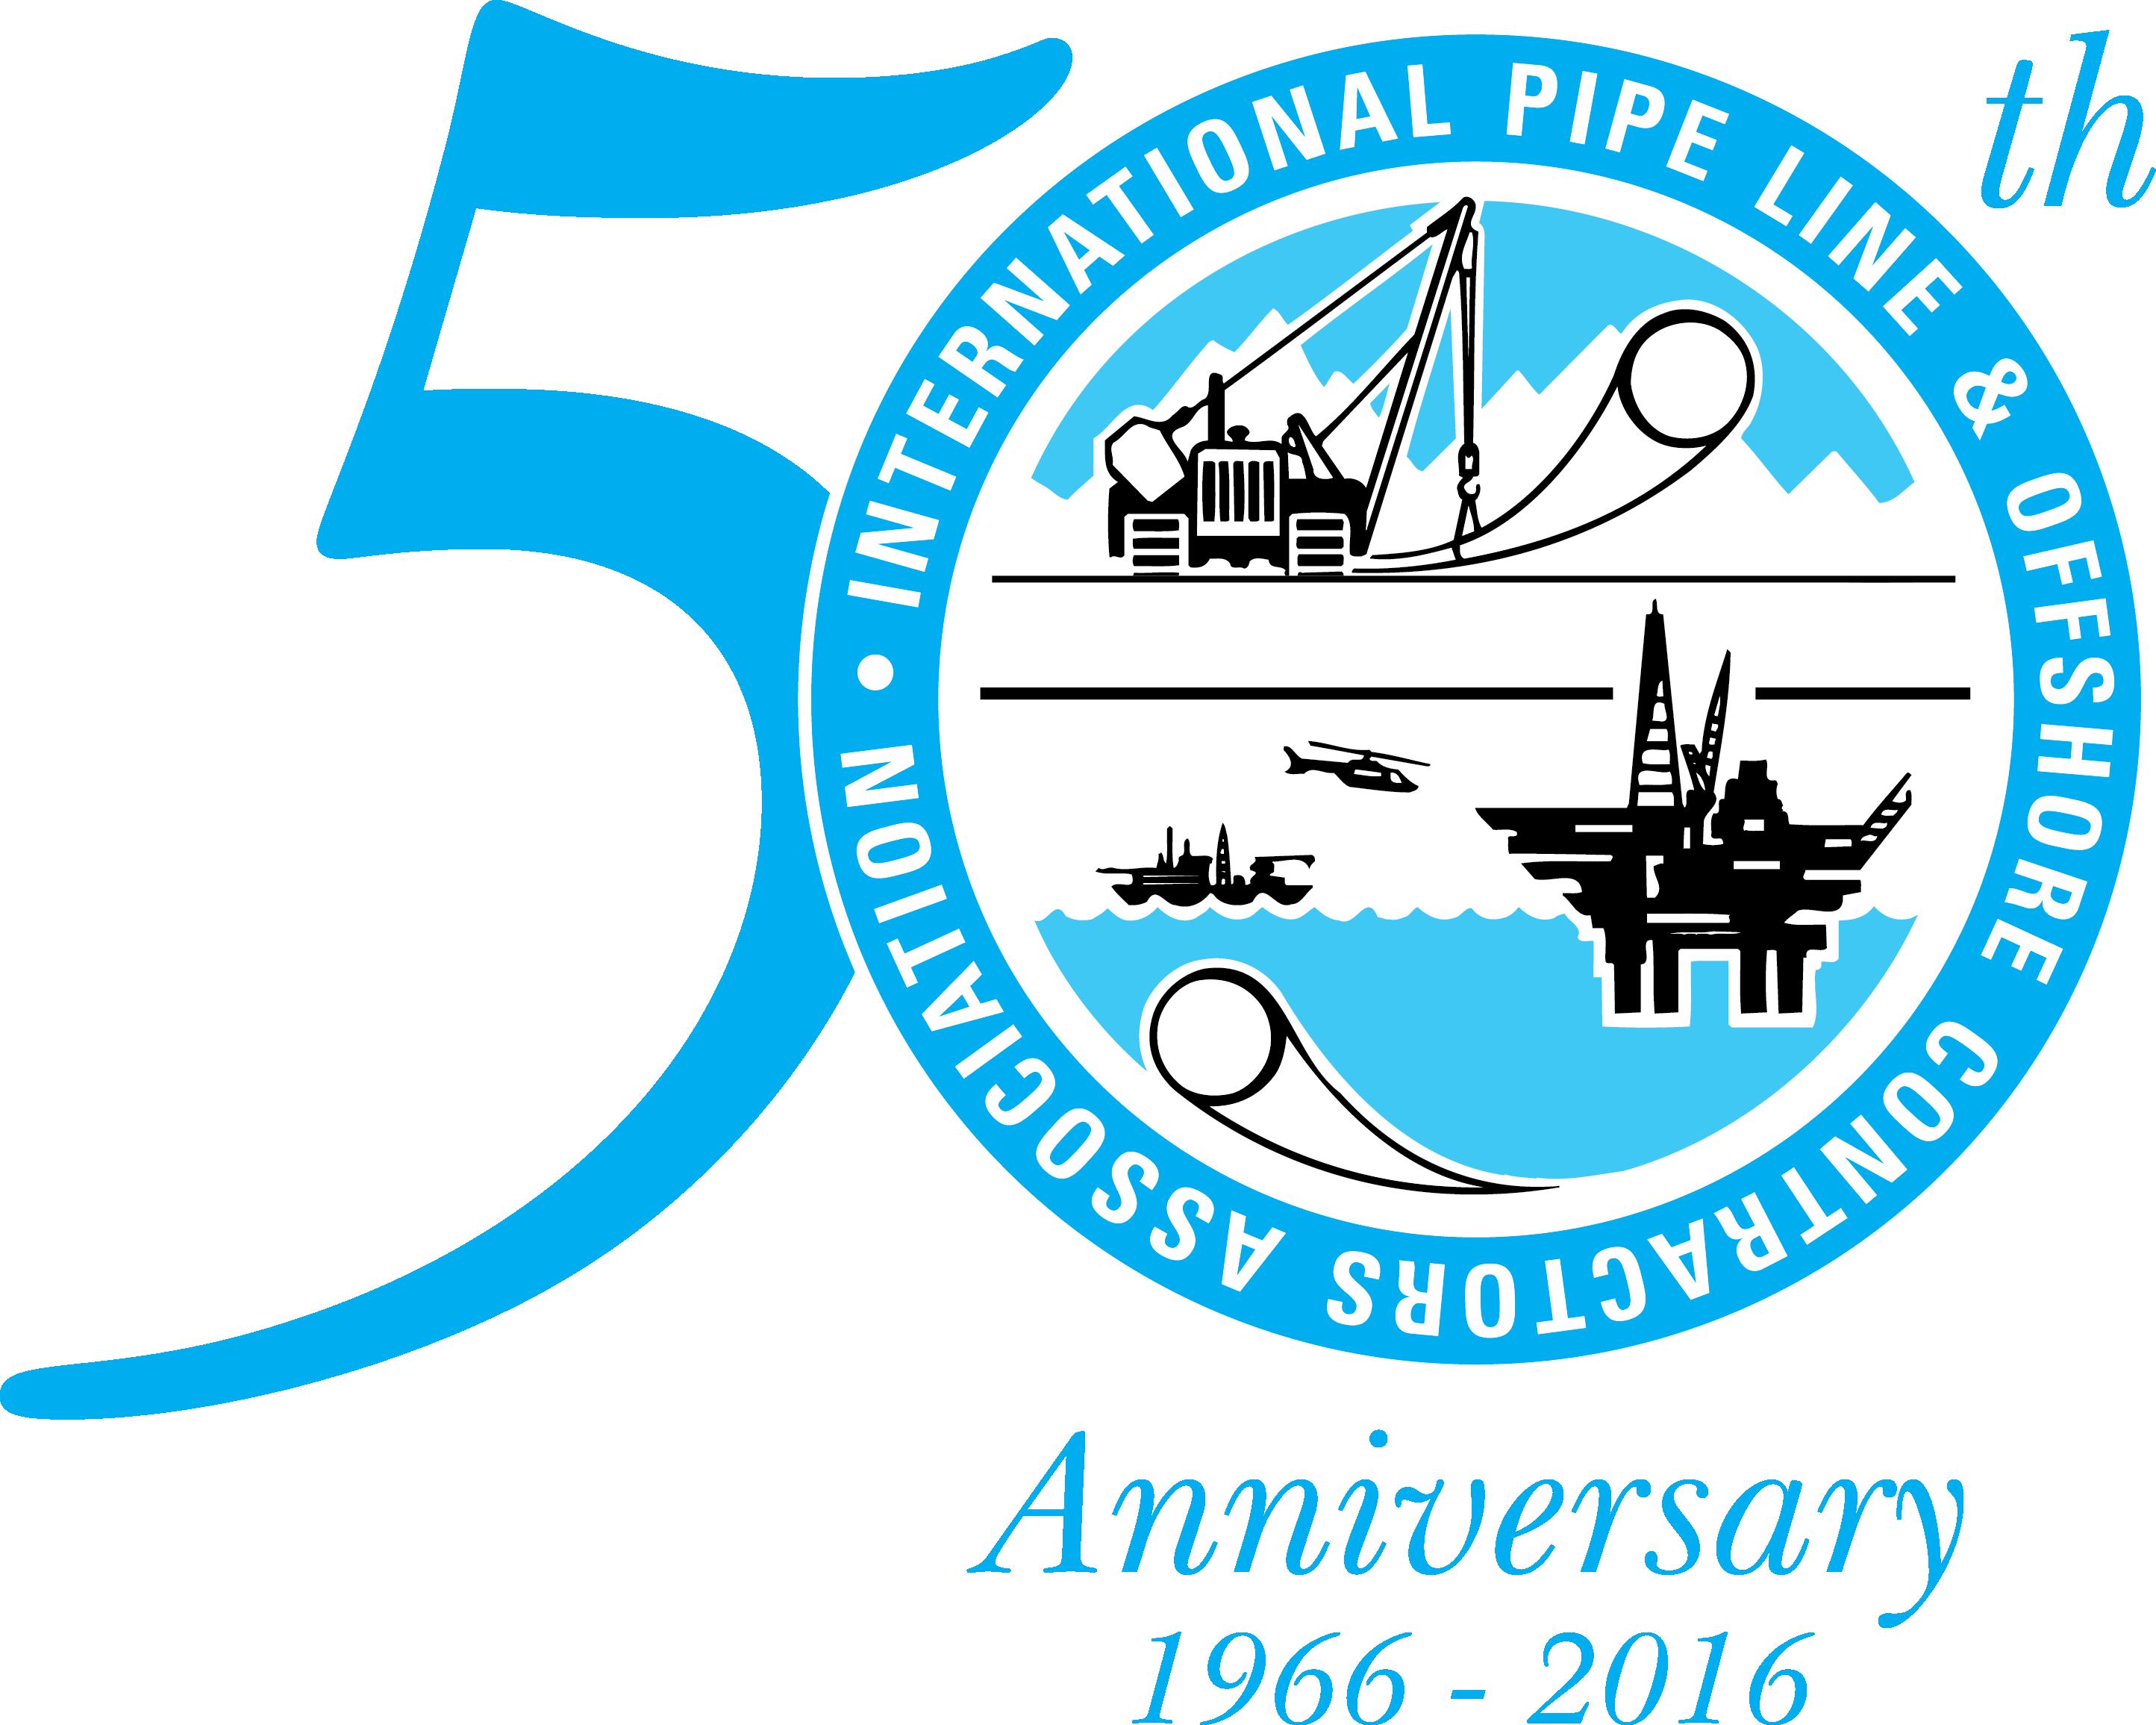 IPLOCA 50th Anniversary Logo final outline transparent